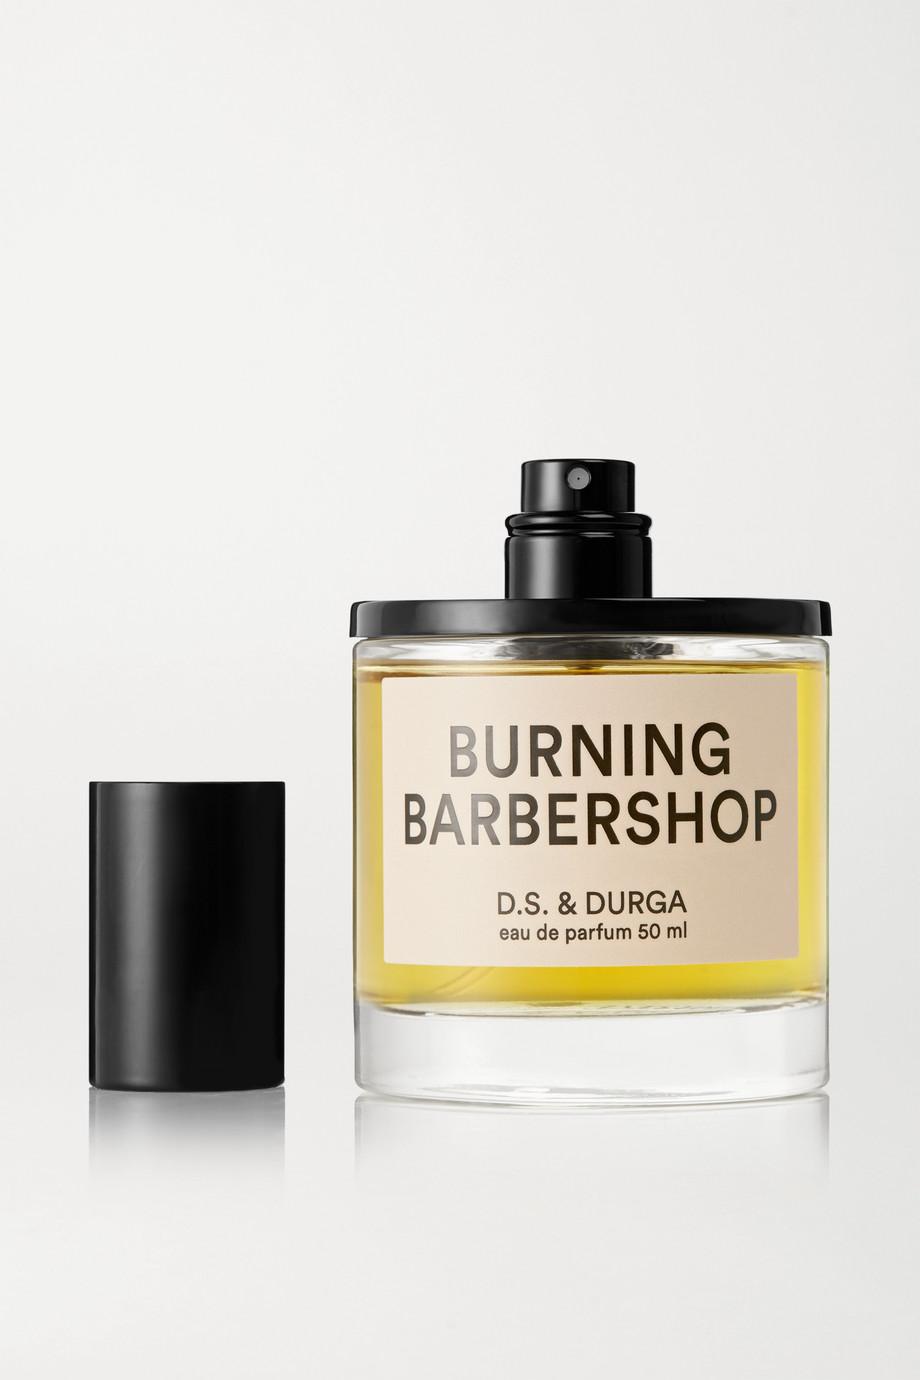 D.S. & Durga Eau de Parfum - Burning Barbershop, 50ml